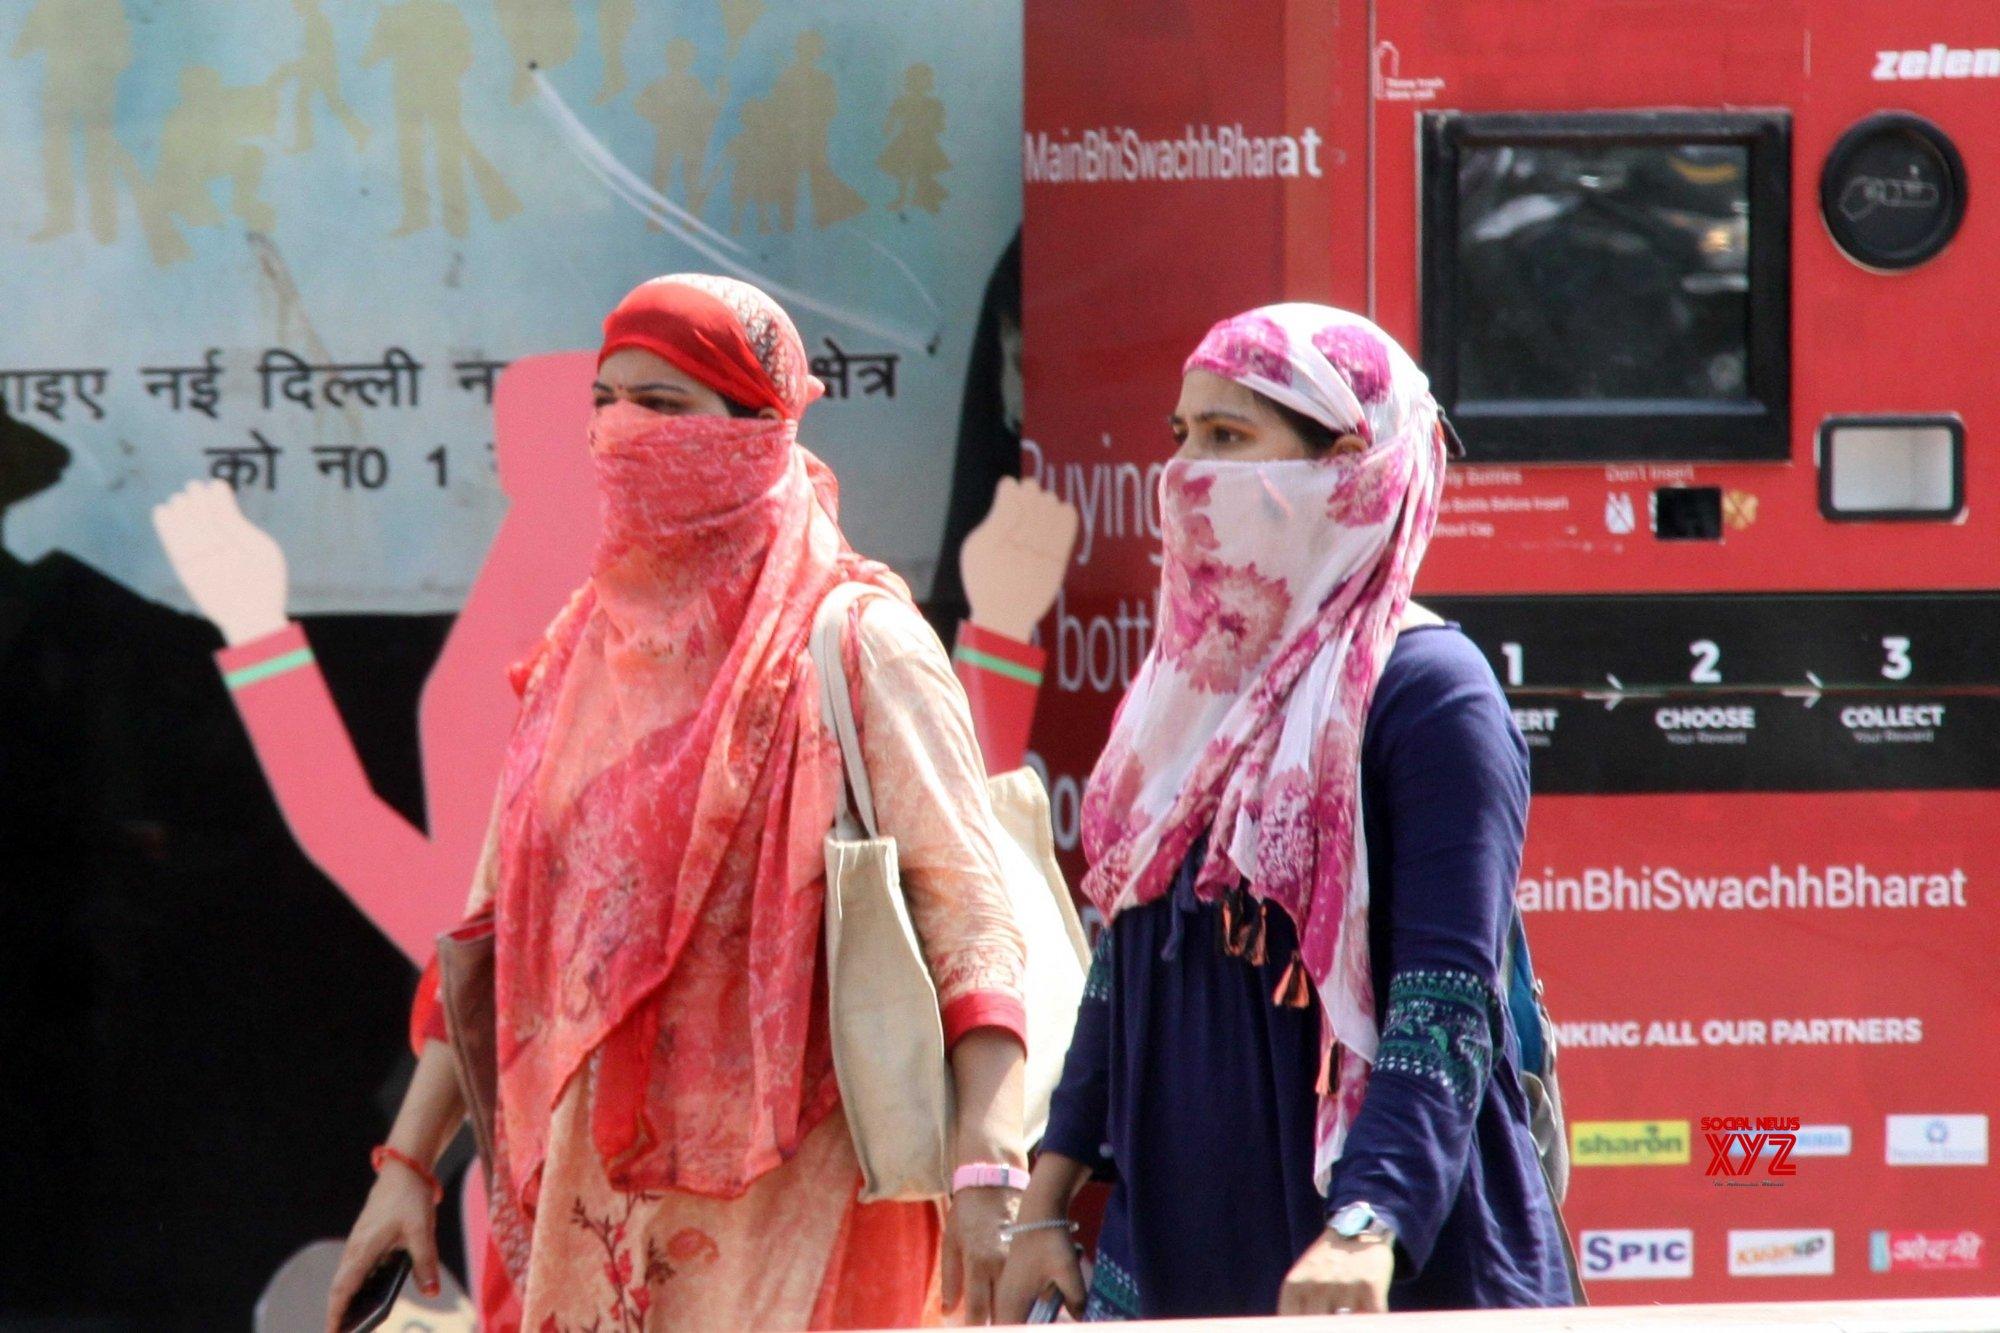 New Delhi: Hot day #Gallery